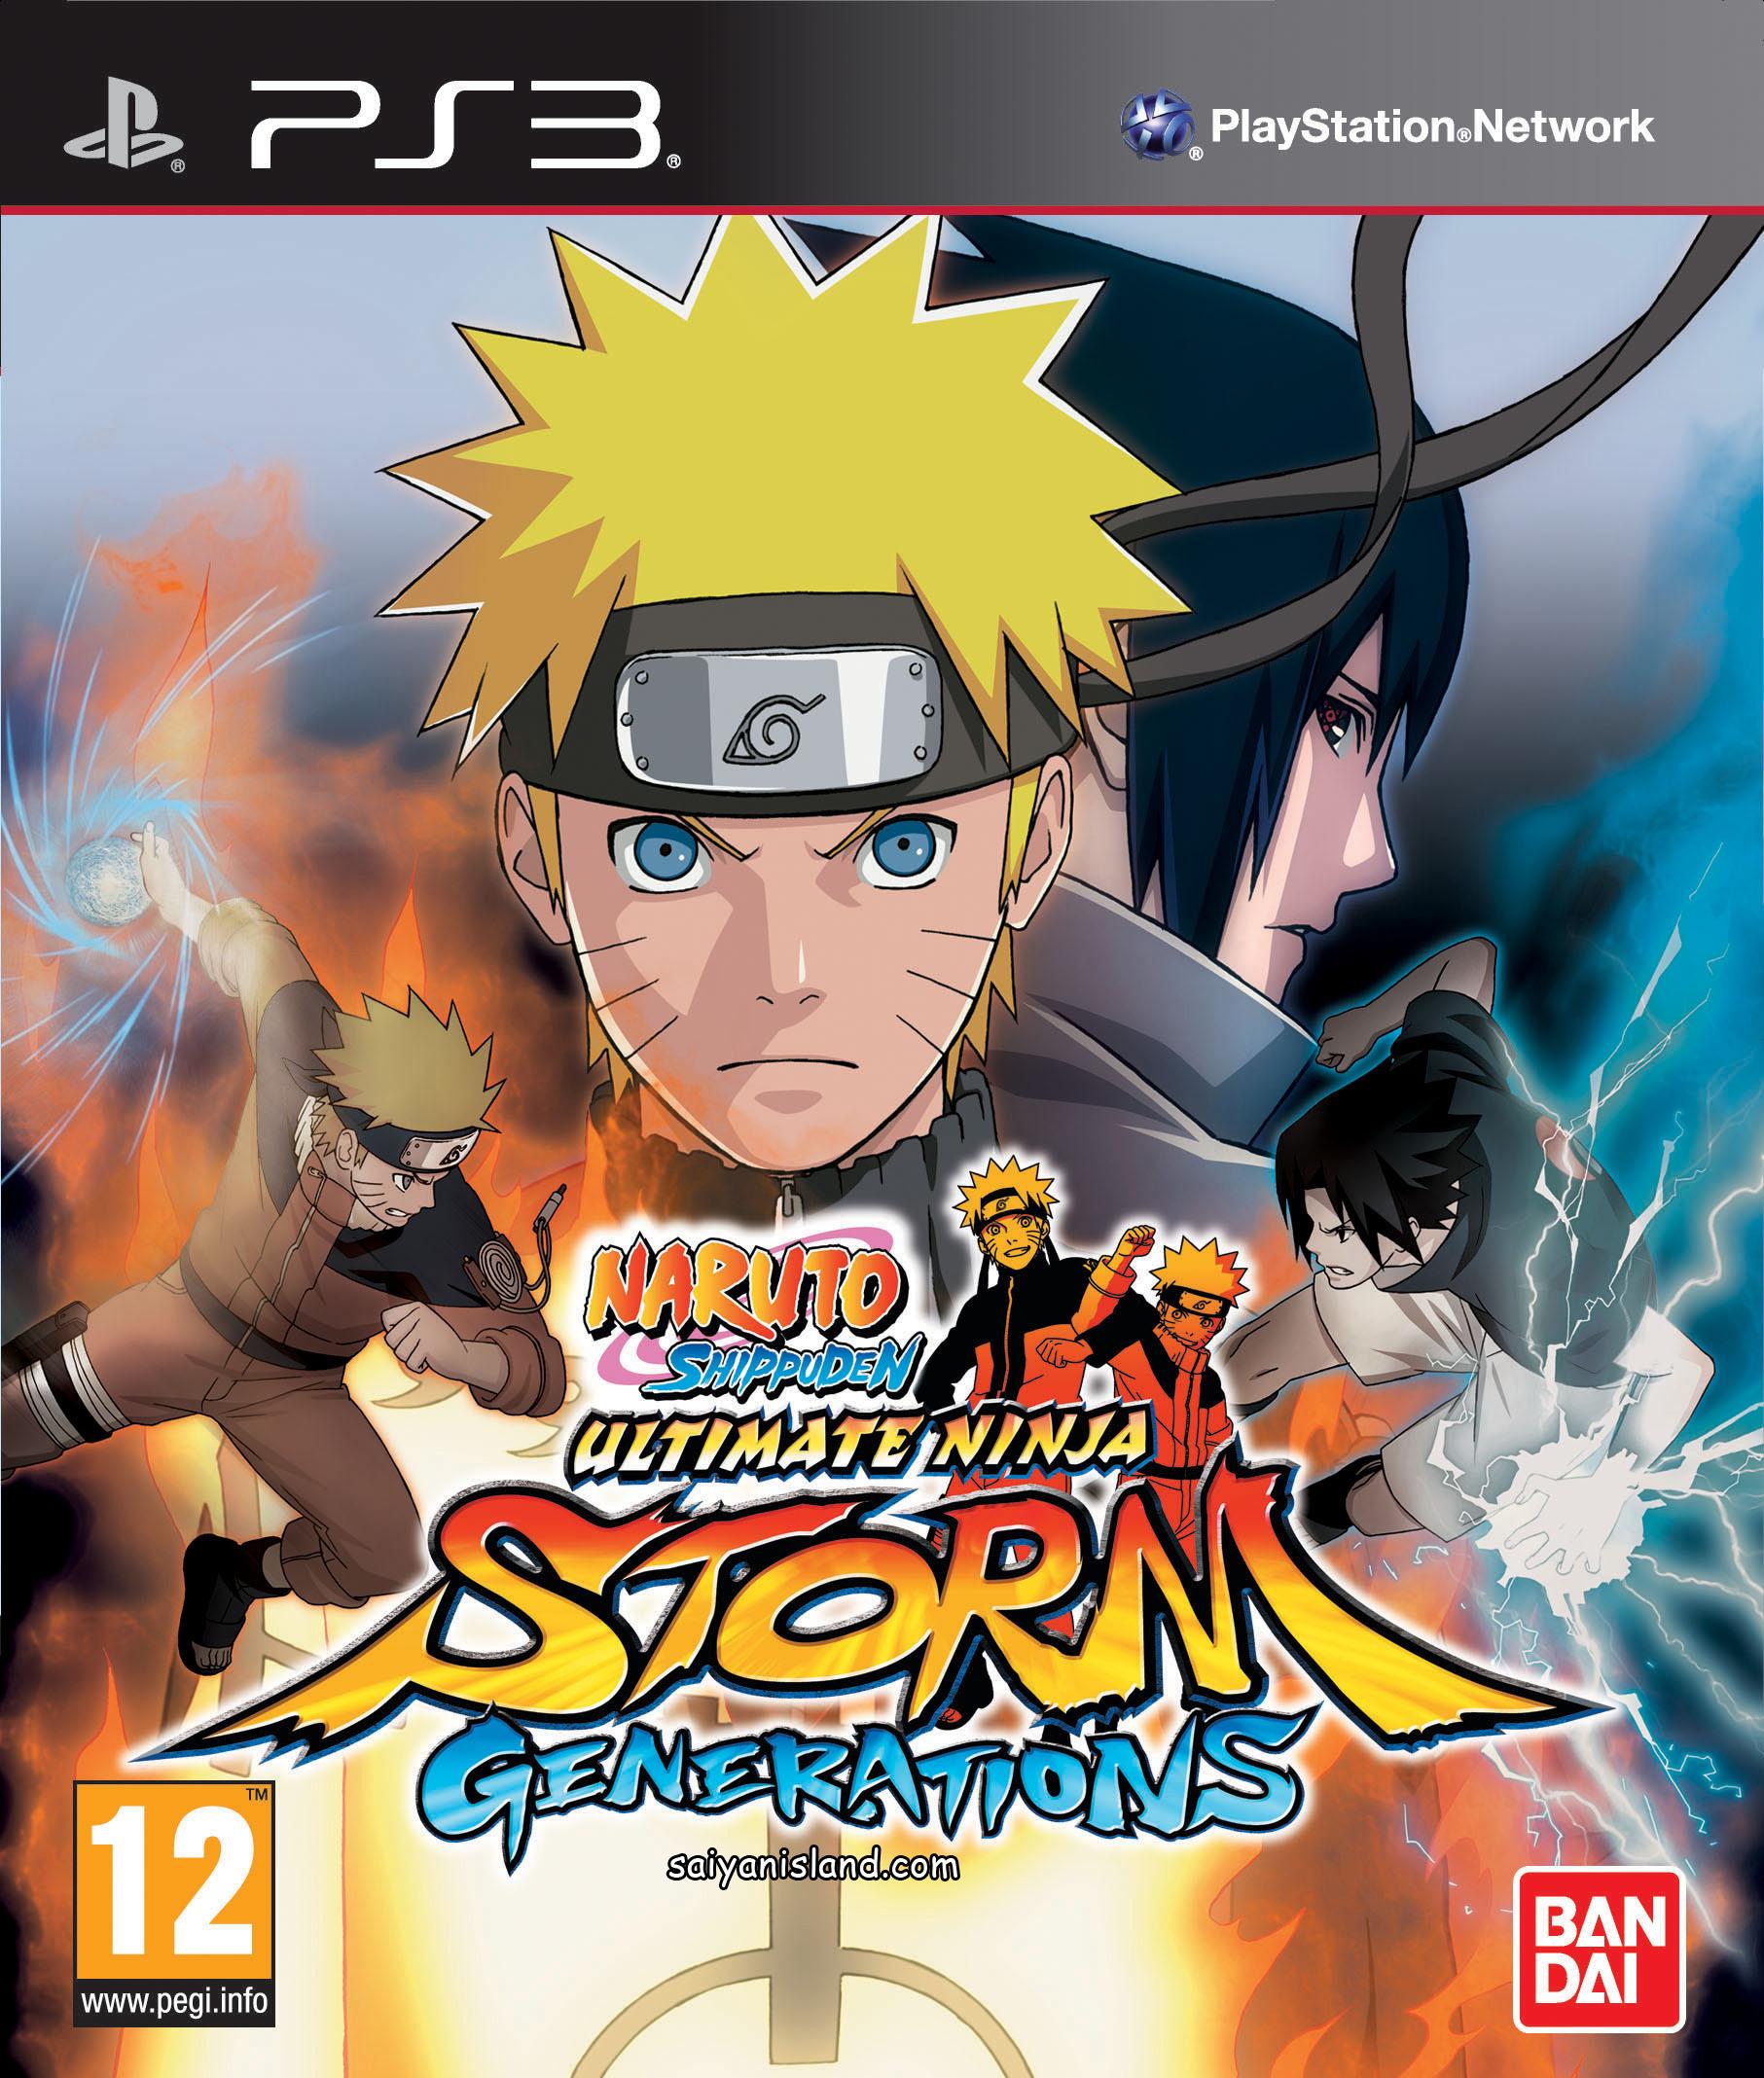 Kết quả hình ảnh cho naruto Shippūden: Ultimate Ninja Storm Generations OVA Hashirama Senju vs Madara Uchiha poster